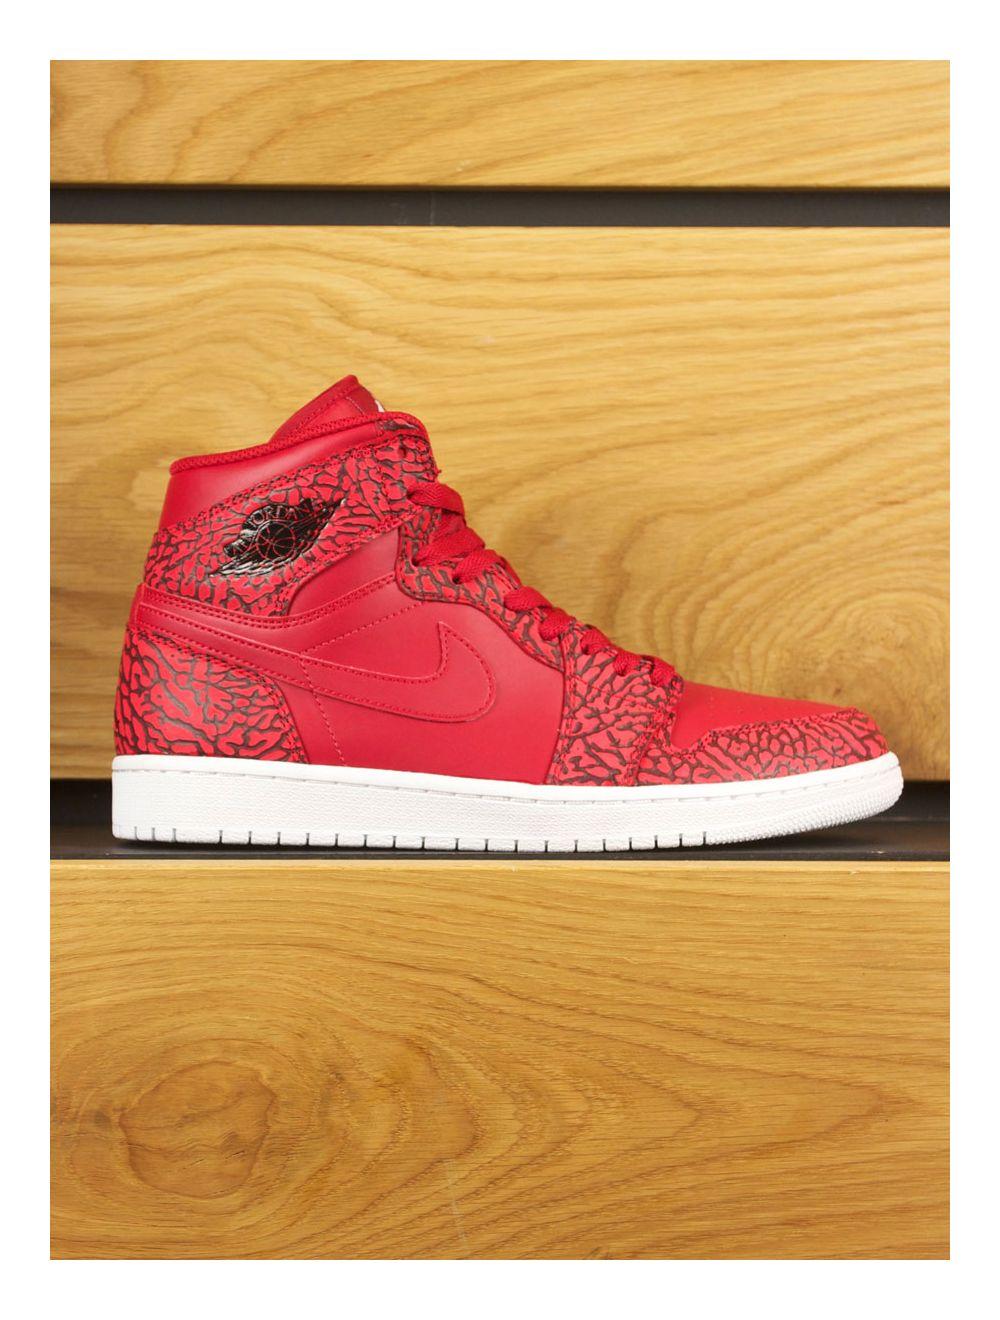 uk availability 8e56b 78722 Nike Air Jordan 1 Retro High 'Un-Supreme' Cement - Red